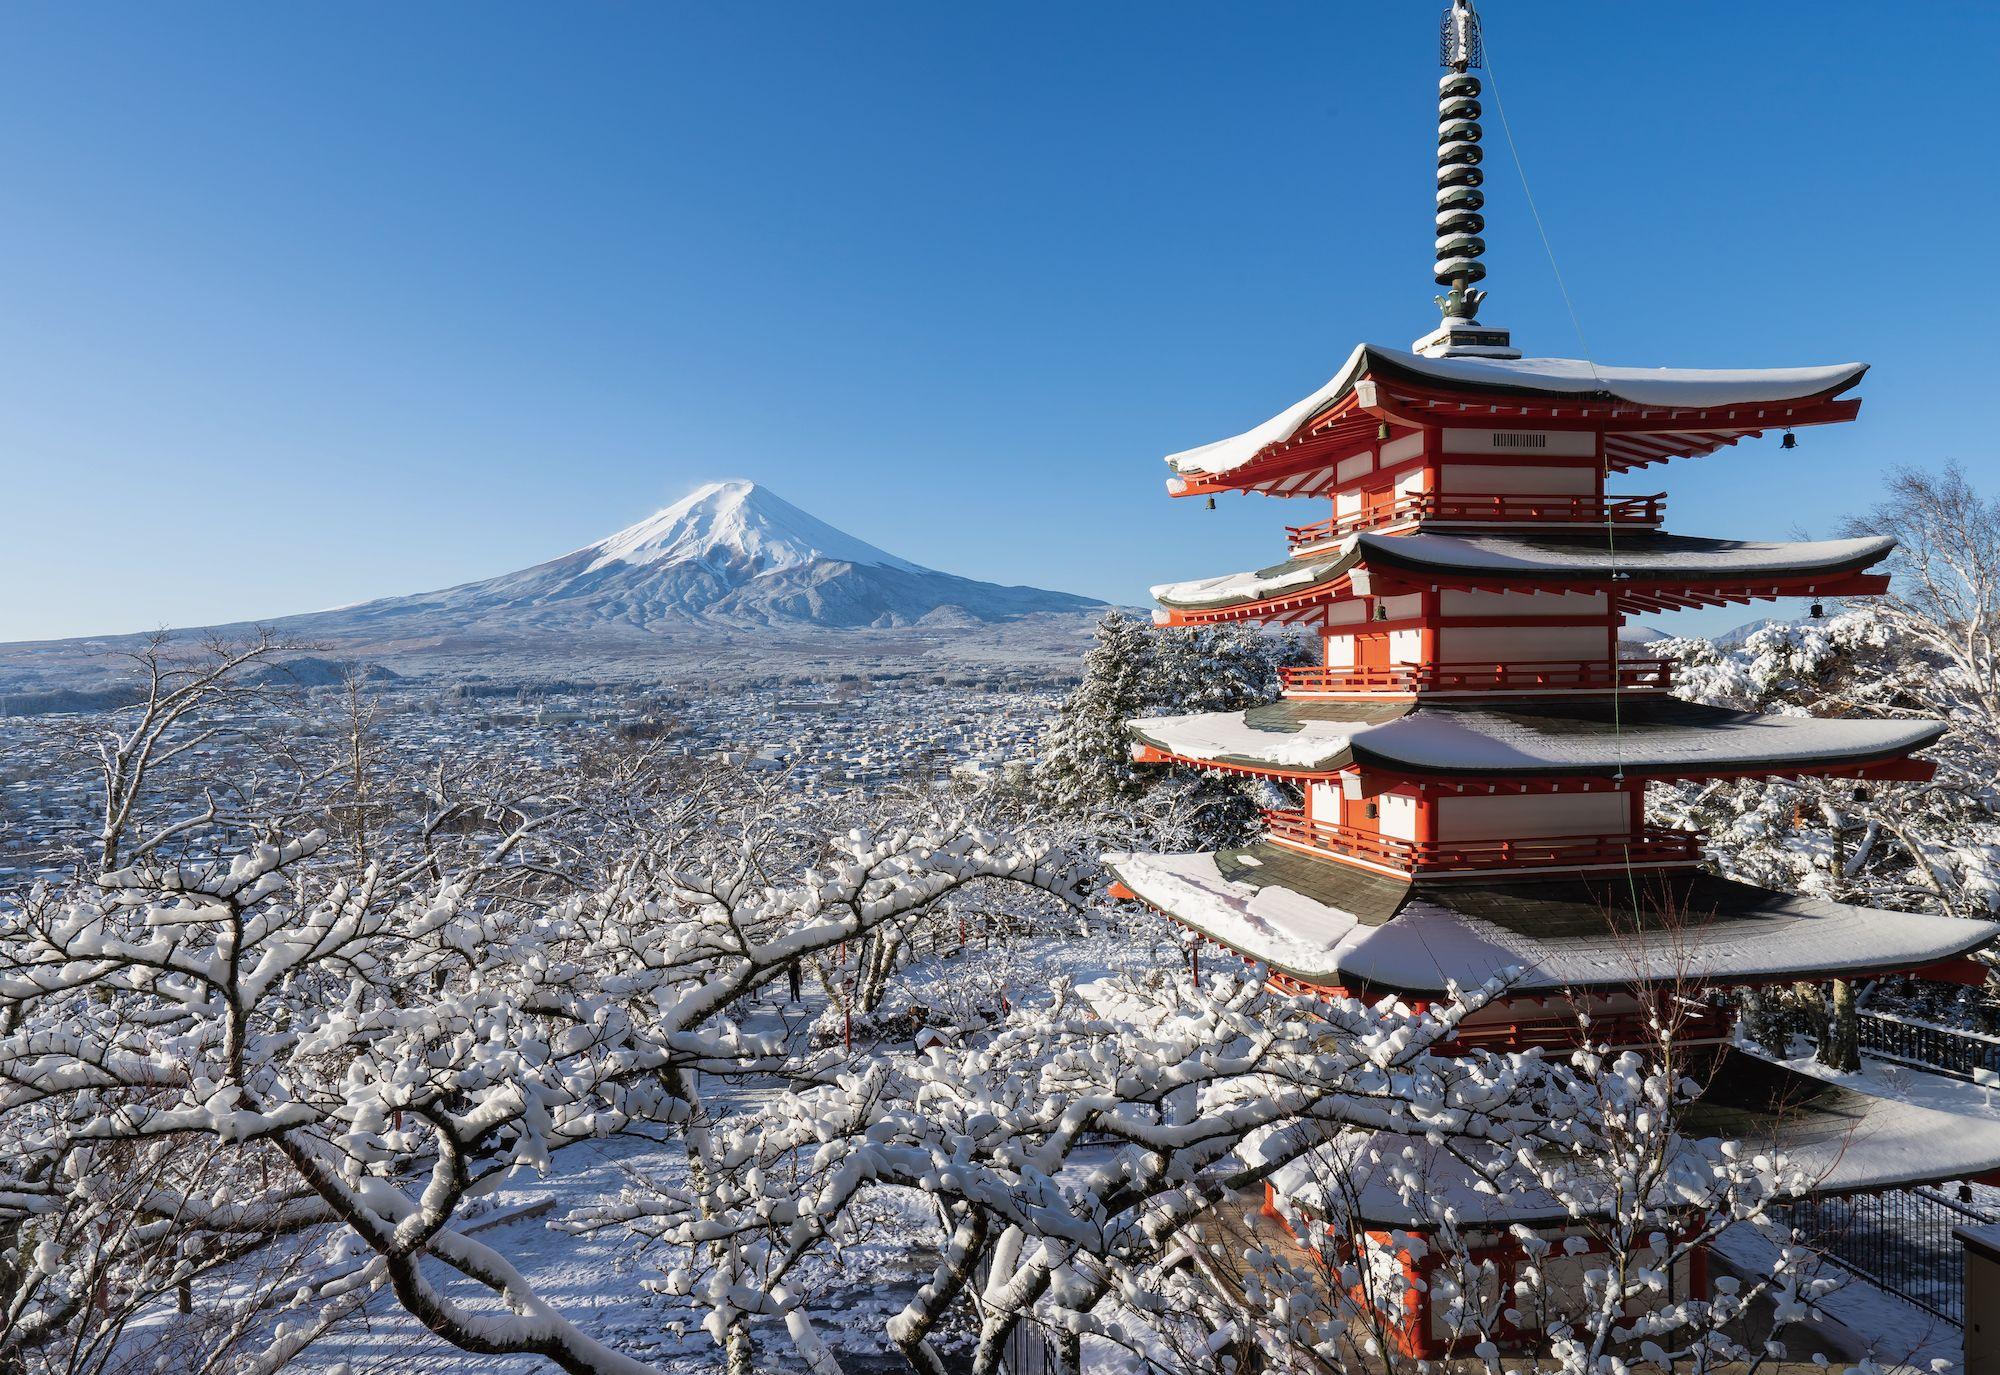 Photo by : Kousuke Kitajima . Follow us for amazing posts! #PASHADELIC #FUJIdelic . . #sony #ilce7m3 #mtfuji #fujiyama #fujisan #photography #photooftheday #nature #naturephotography #landscape #landscapephotography #japan #japan_of_insta #japanphoto #igers #ig_japan #mountain #mountains #mountainphotography #富士山 #富士 #山